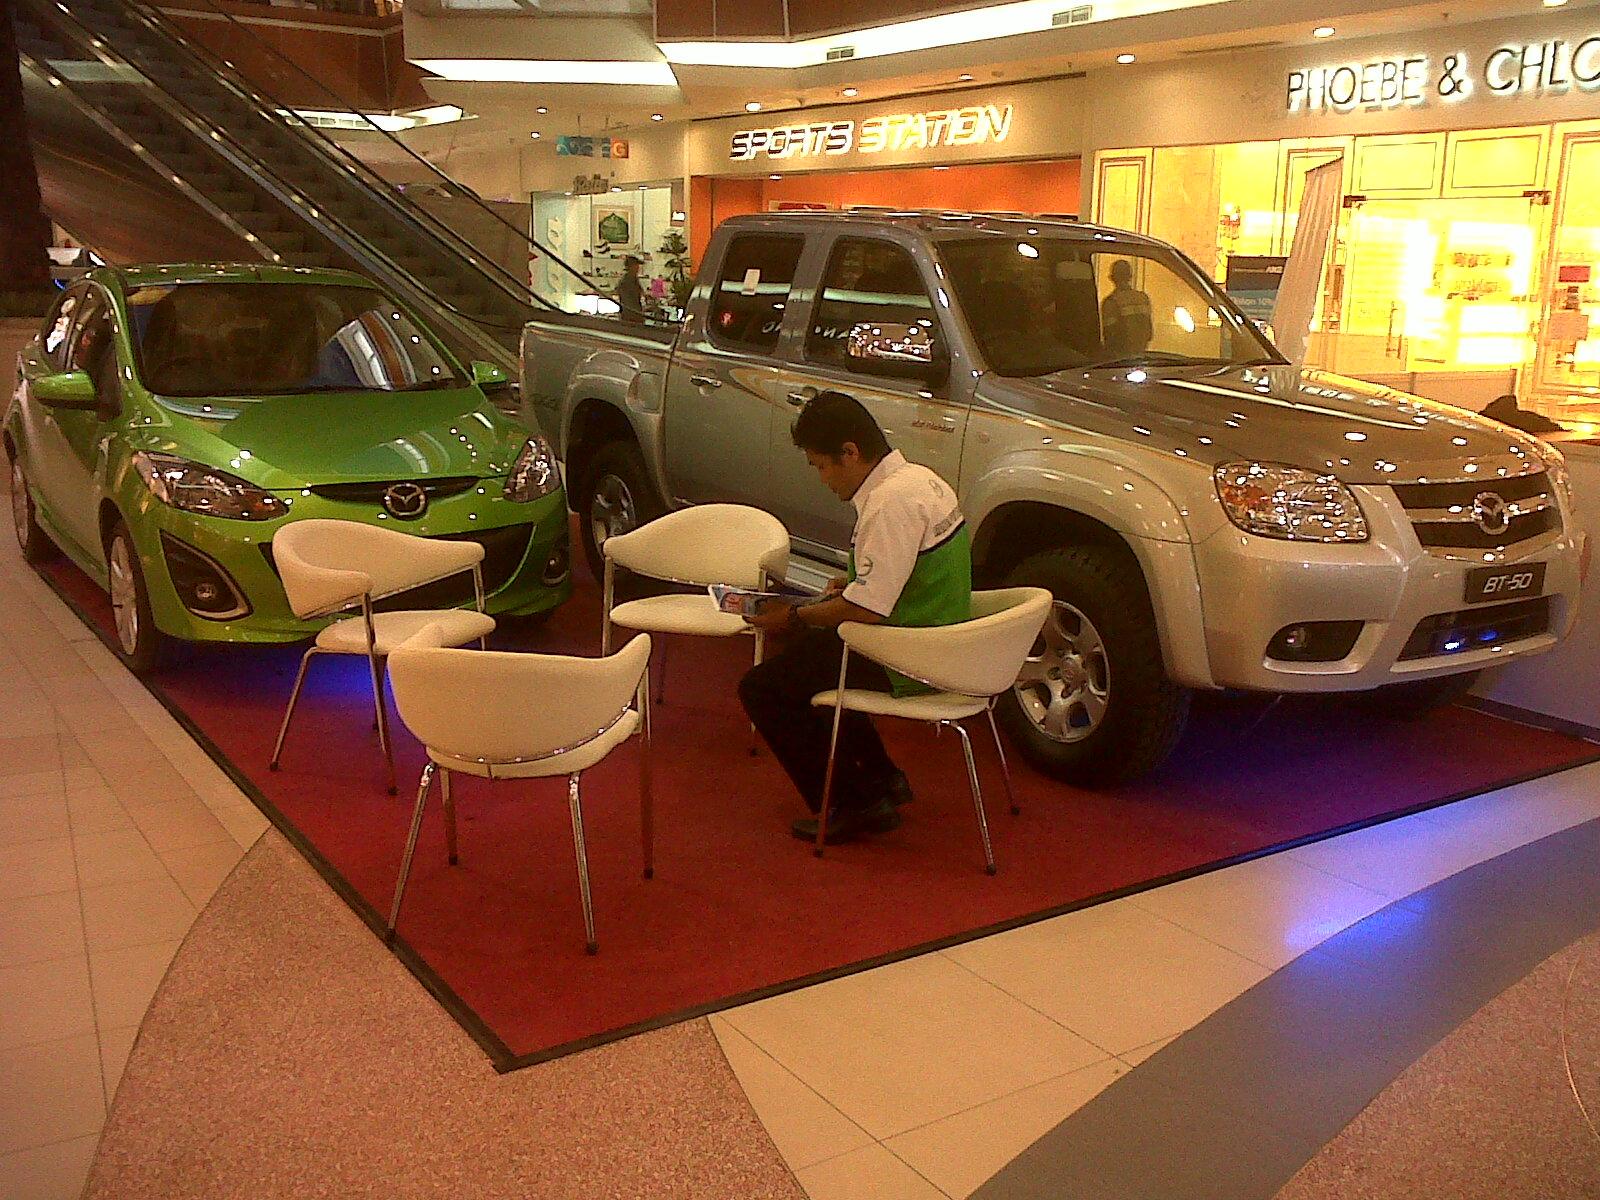 Beli Mobil Kredit Rugi Ah Masak Iya Sih Moneysmart Indonesia